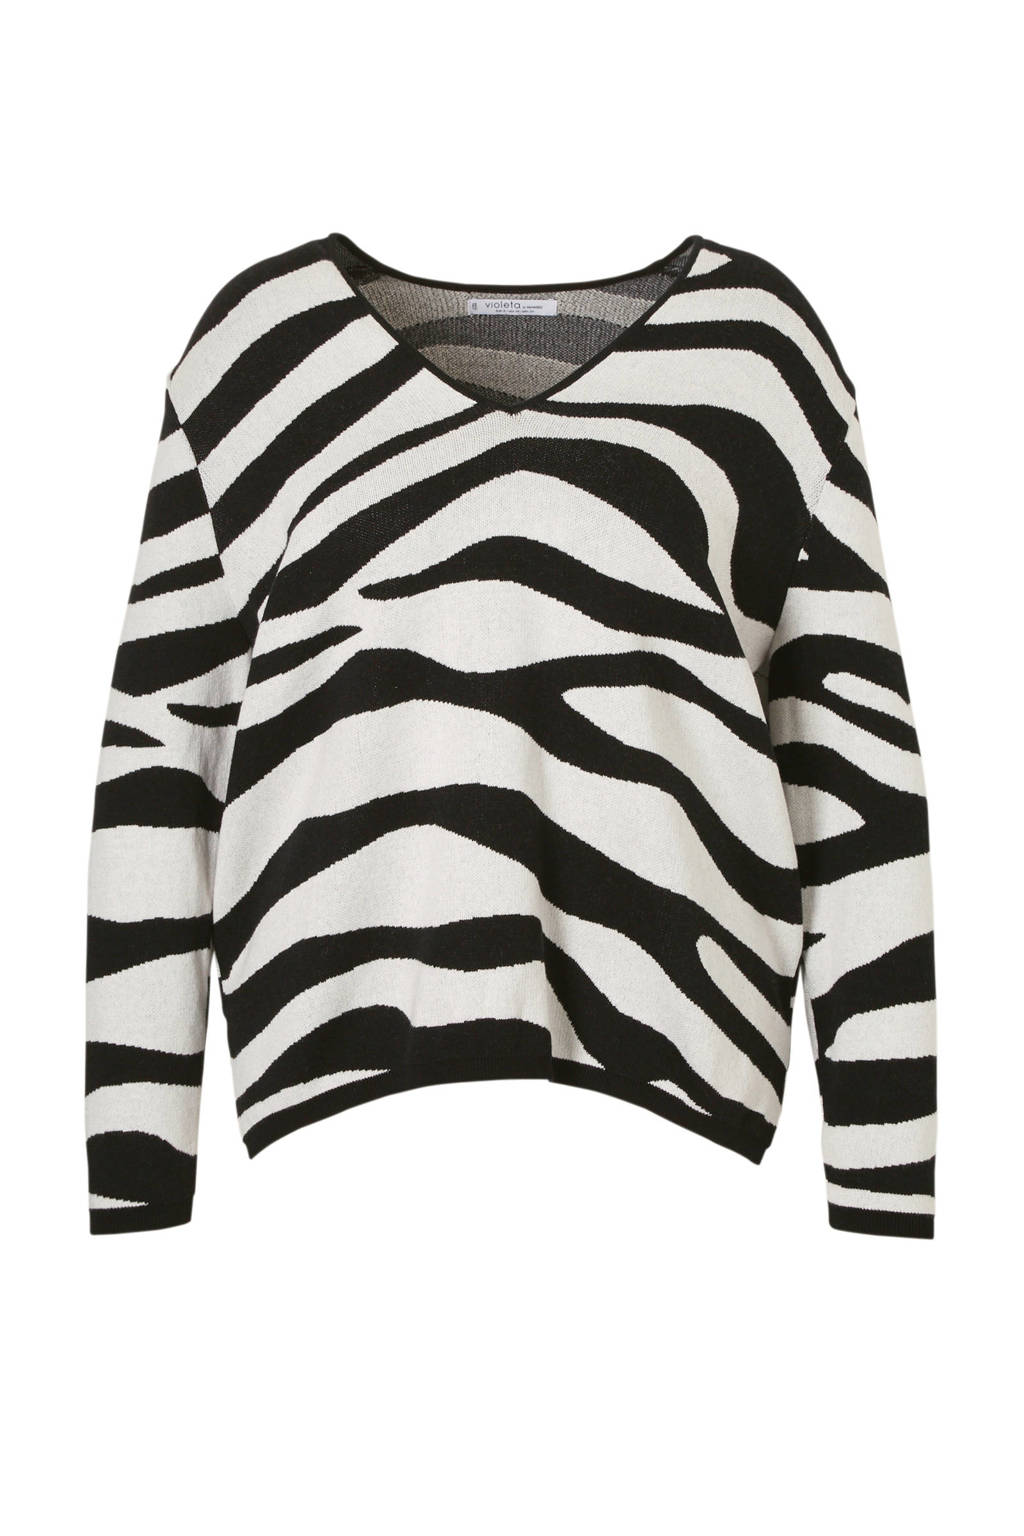 Trui Zwart Wit.Violeta By Mango Trui Met Zebraprint Zwart Wit Wehkamp